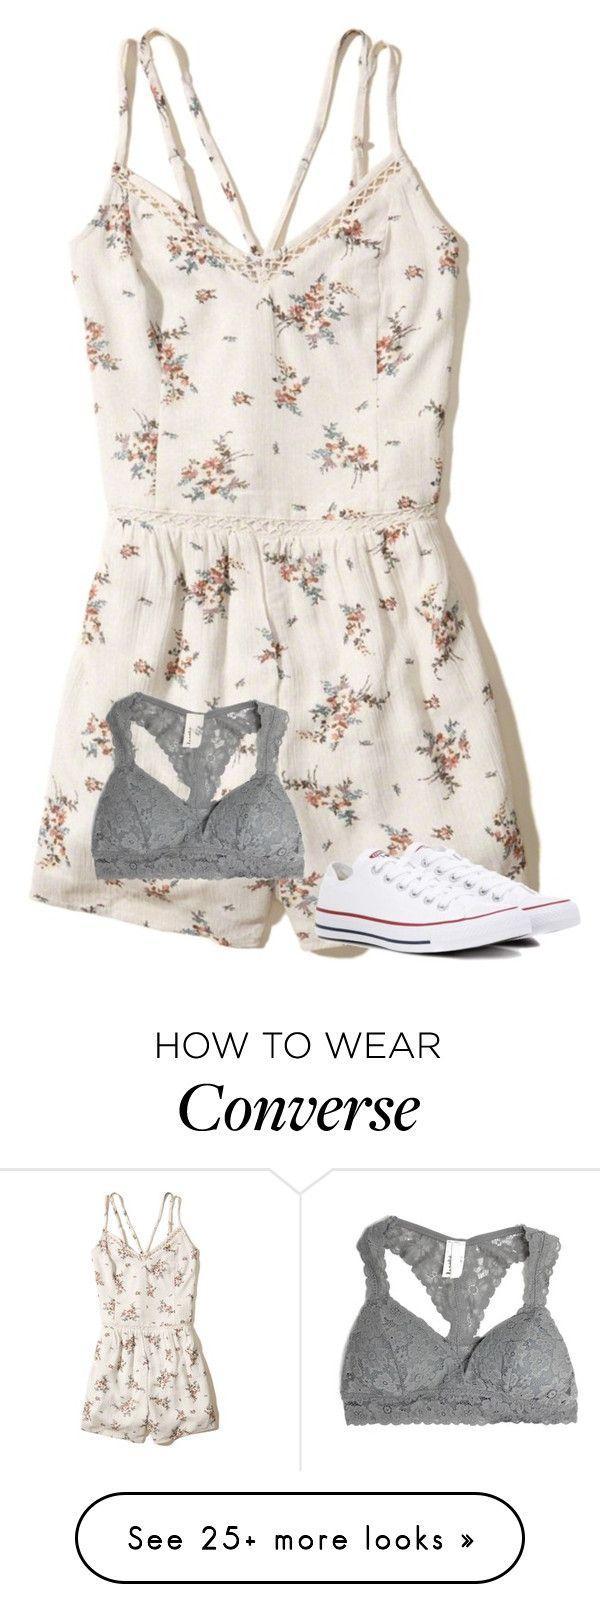 زفاف - Outfits